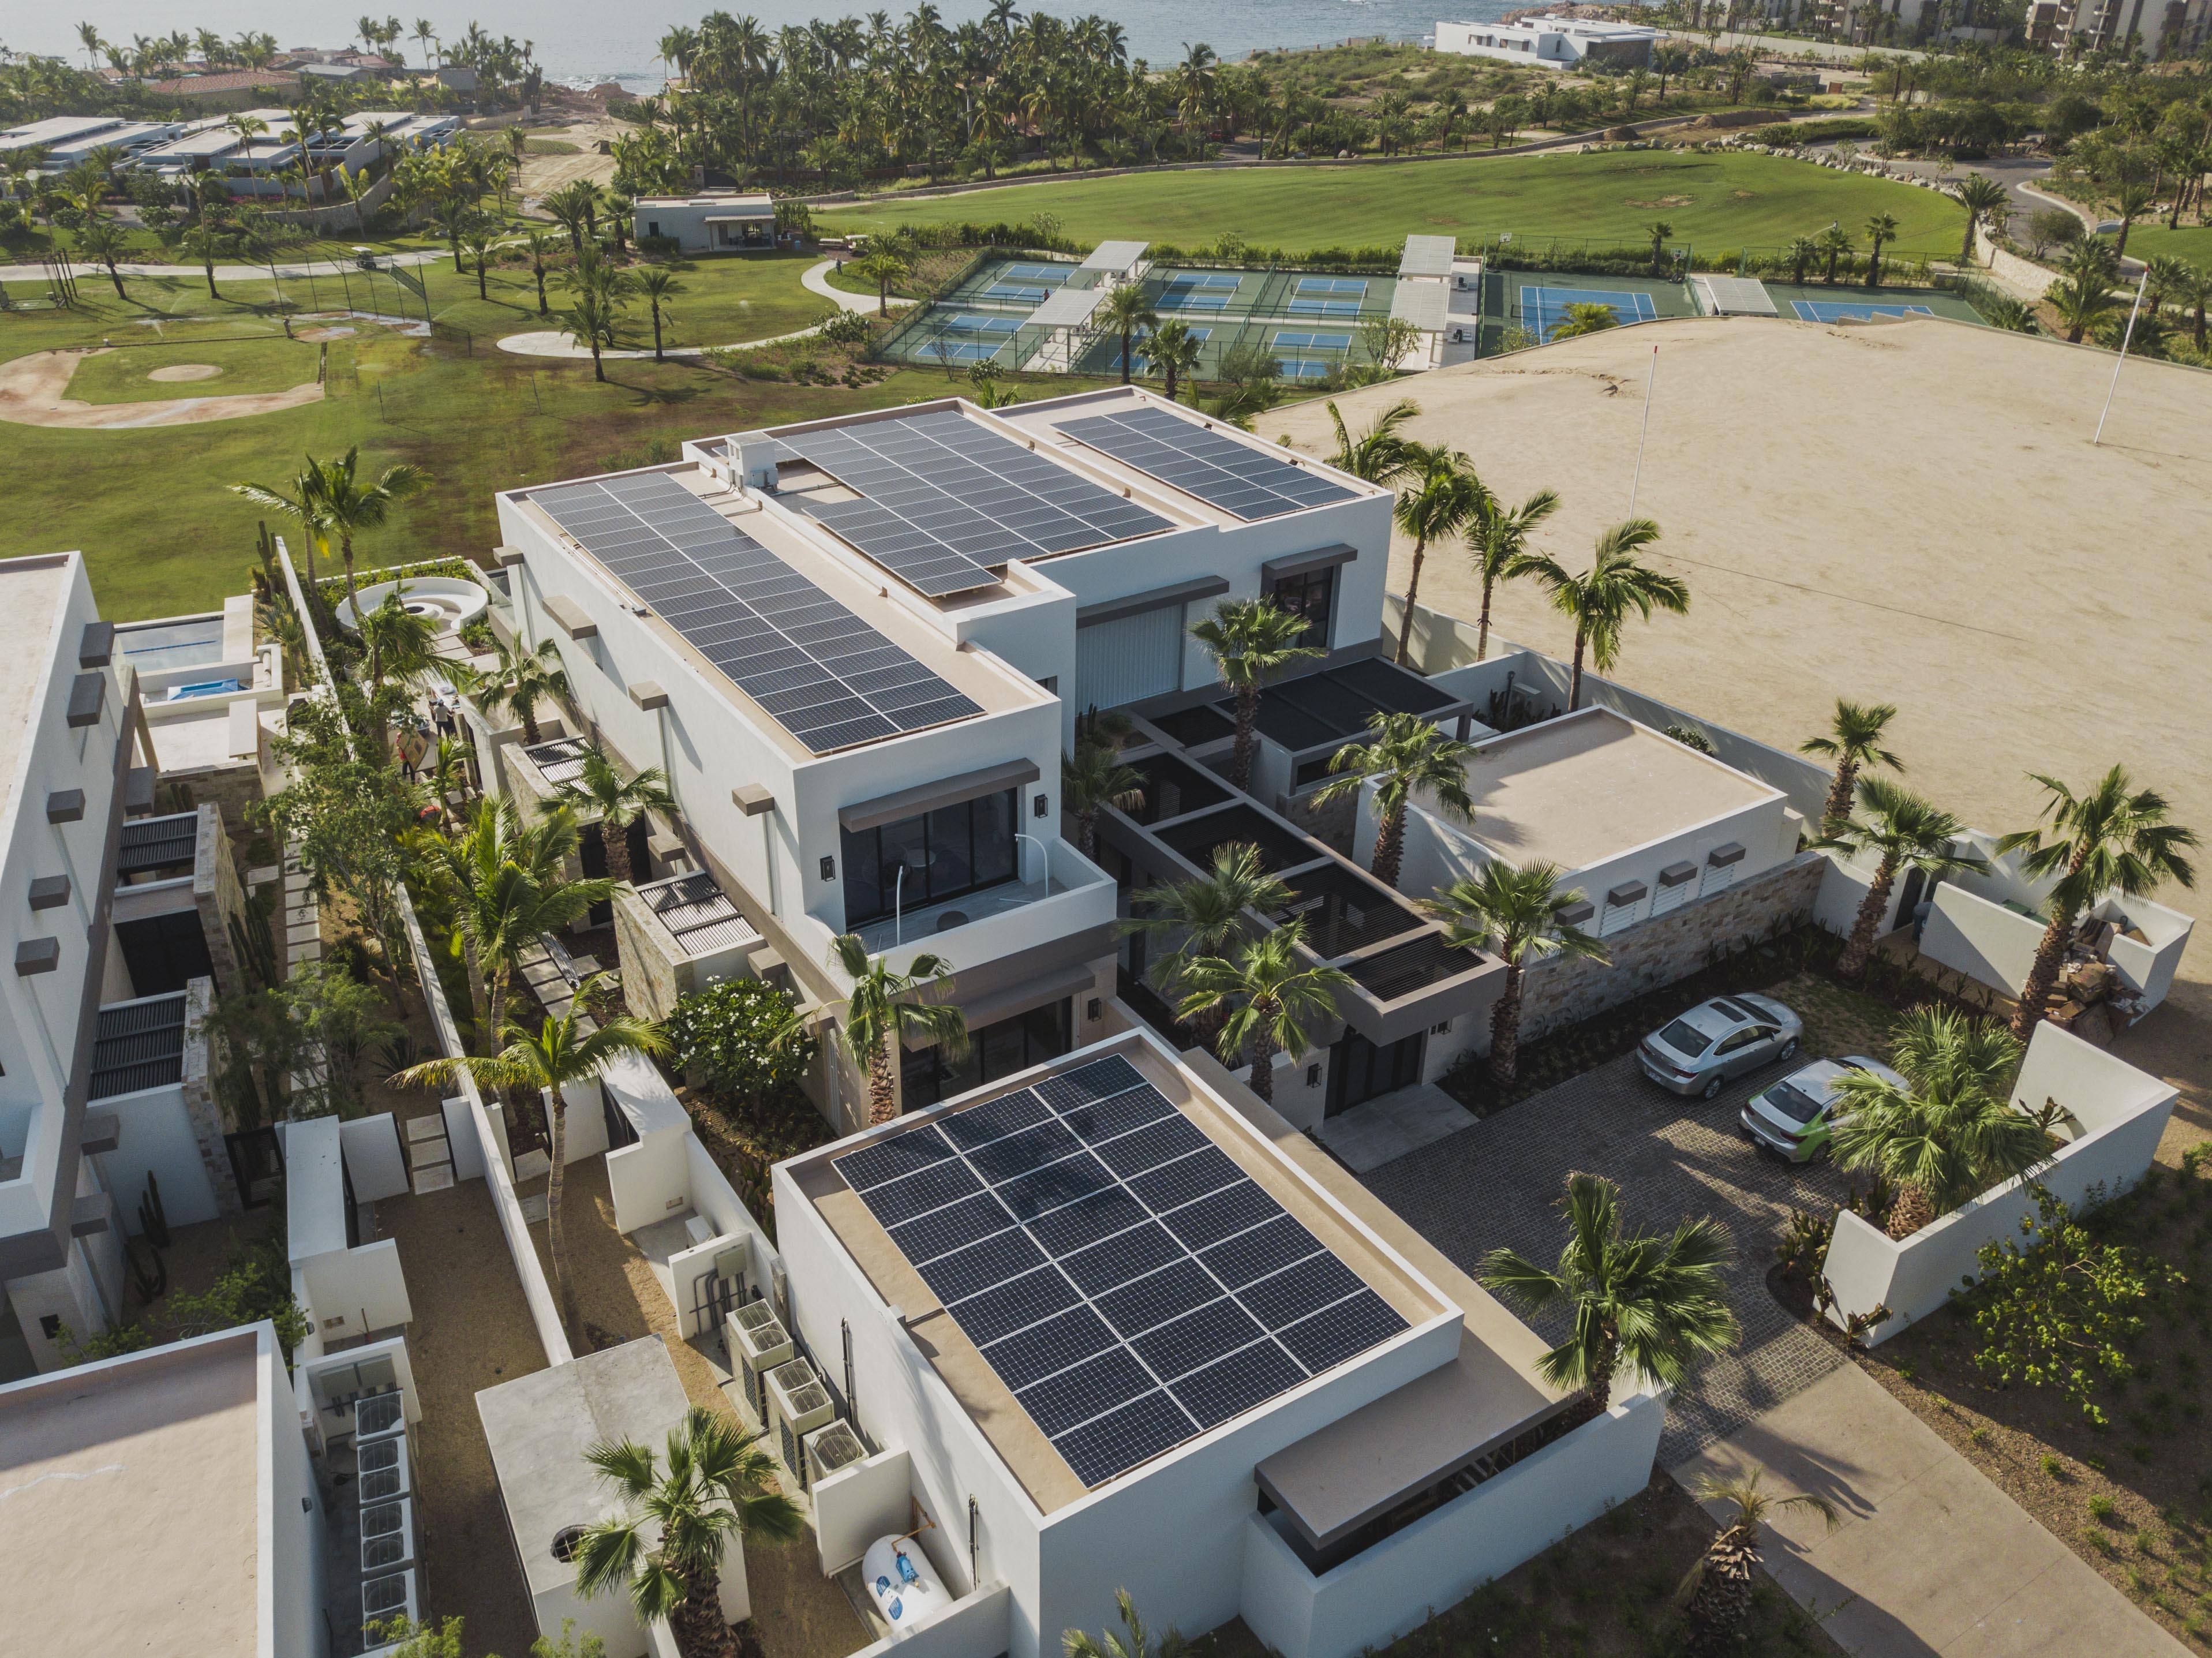 #ENERGYSTORAGEMEXICO #LITHIUMMEXICO #BLUEPLANETENERGY #sunpower #sunpowermexico